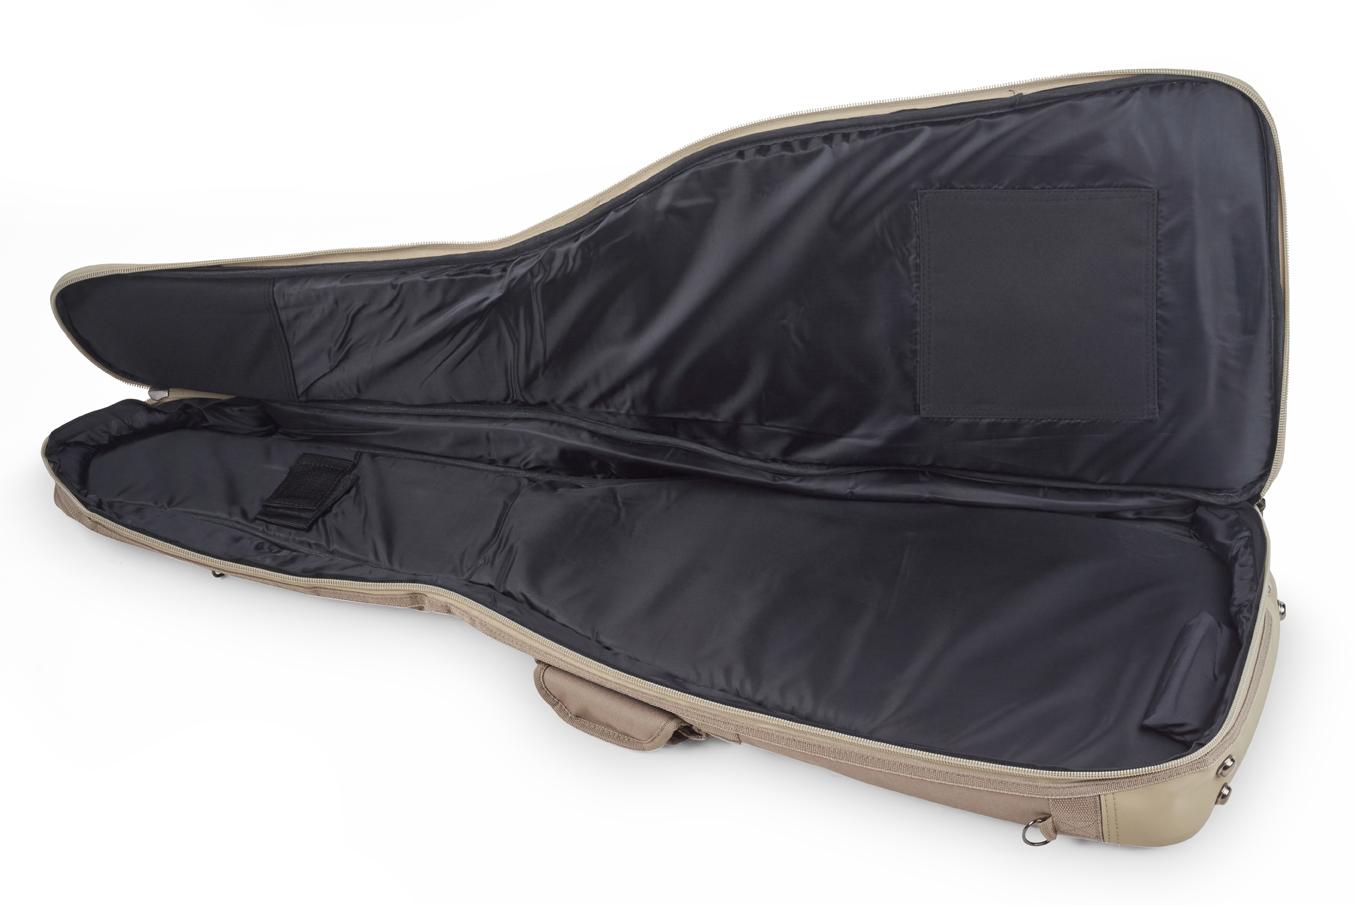 Rockbag RB 20446 K